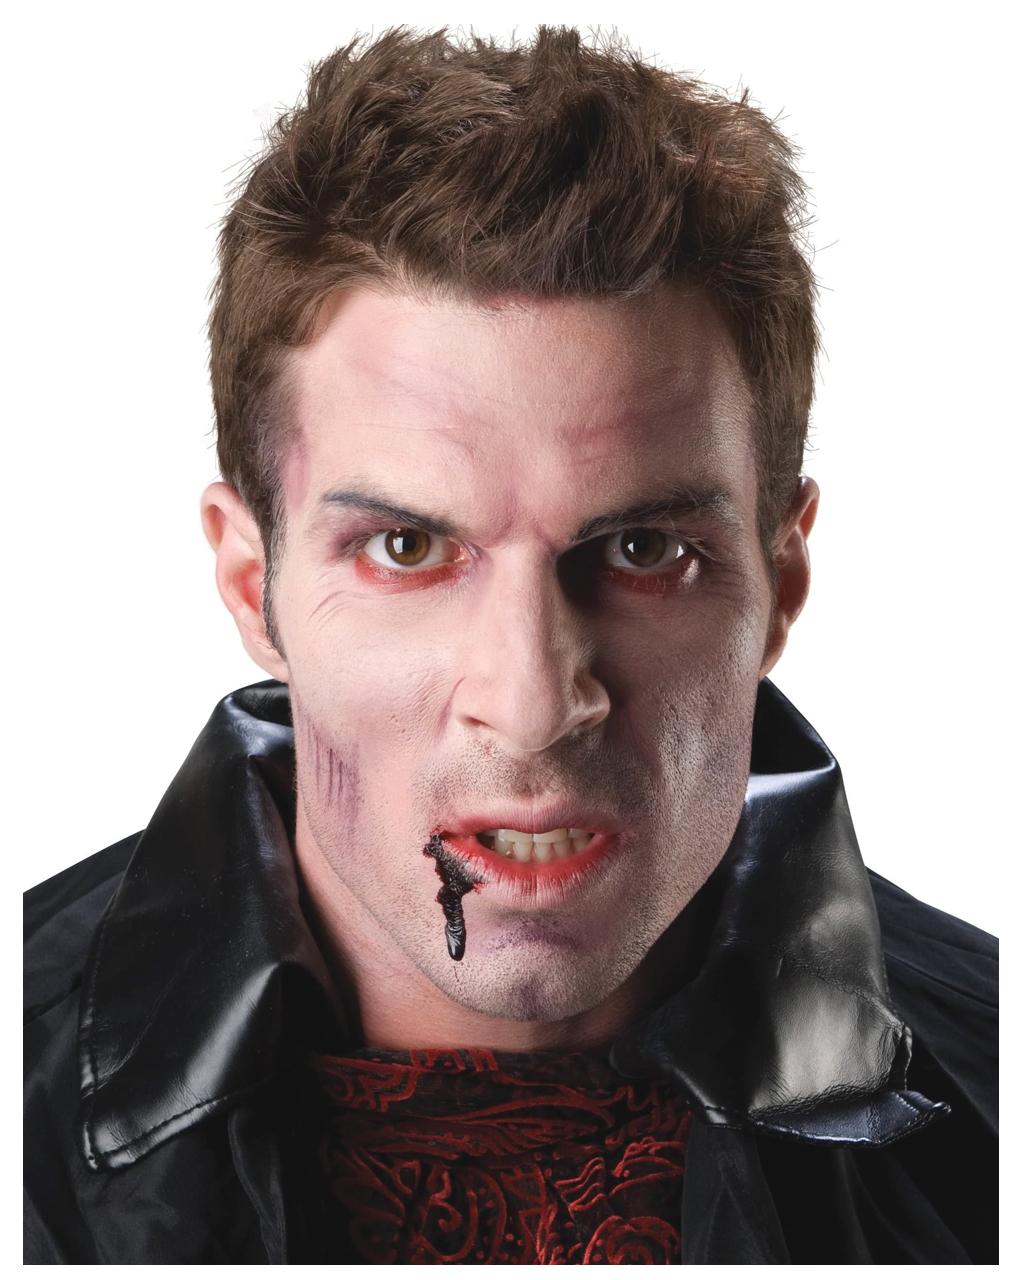 Vampire Makeup Make Up Stack Dracula Liner As Theater Make Up